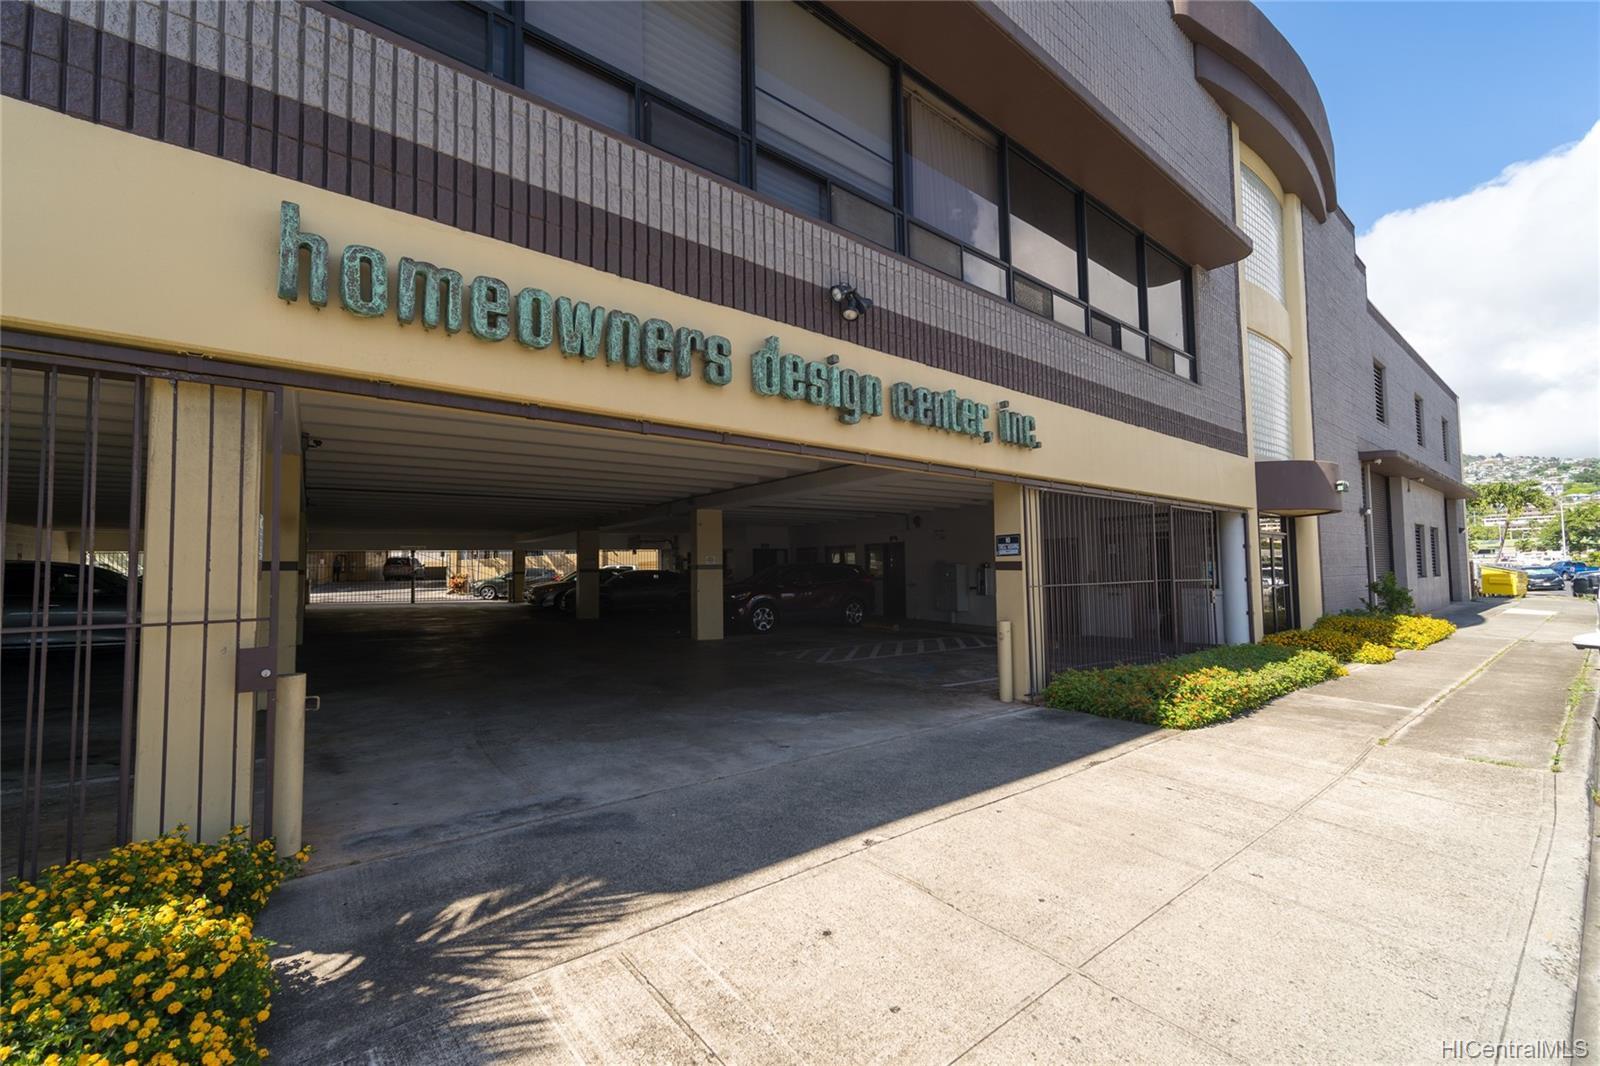 1030 Kohou Street Honolulu Oahu commercial real estate photo2 of 25